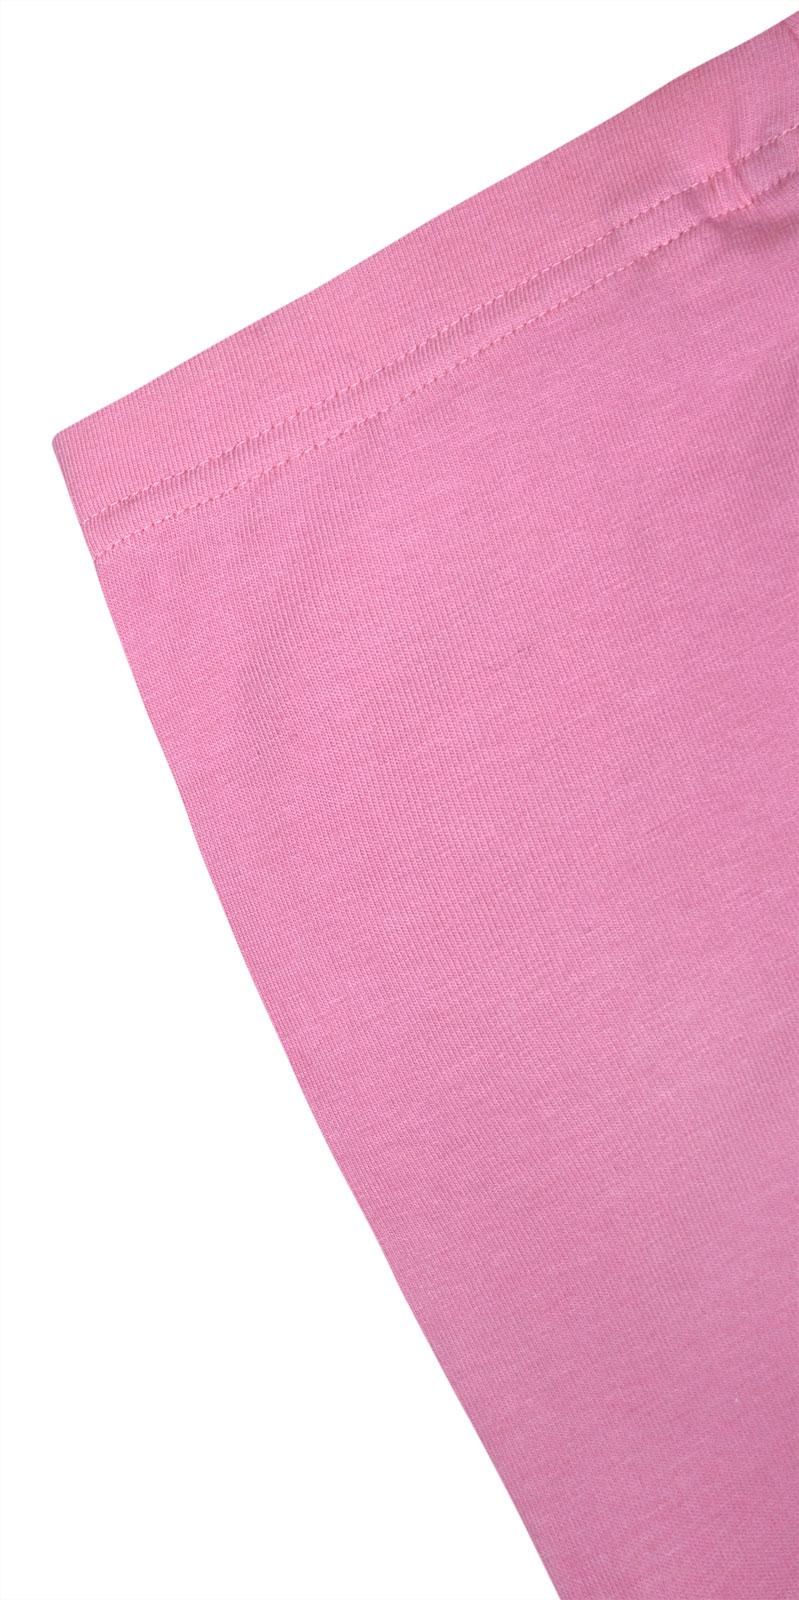 Girls-Next-Leggings-Kids-New-Pants-Age-2-3-4-5-6-7-8-9-10-11-12-13-14-15-16-Yrs thumbnail 37